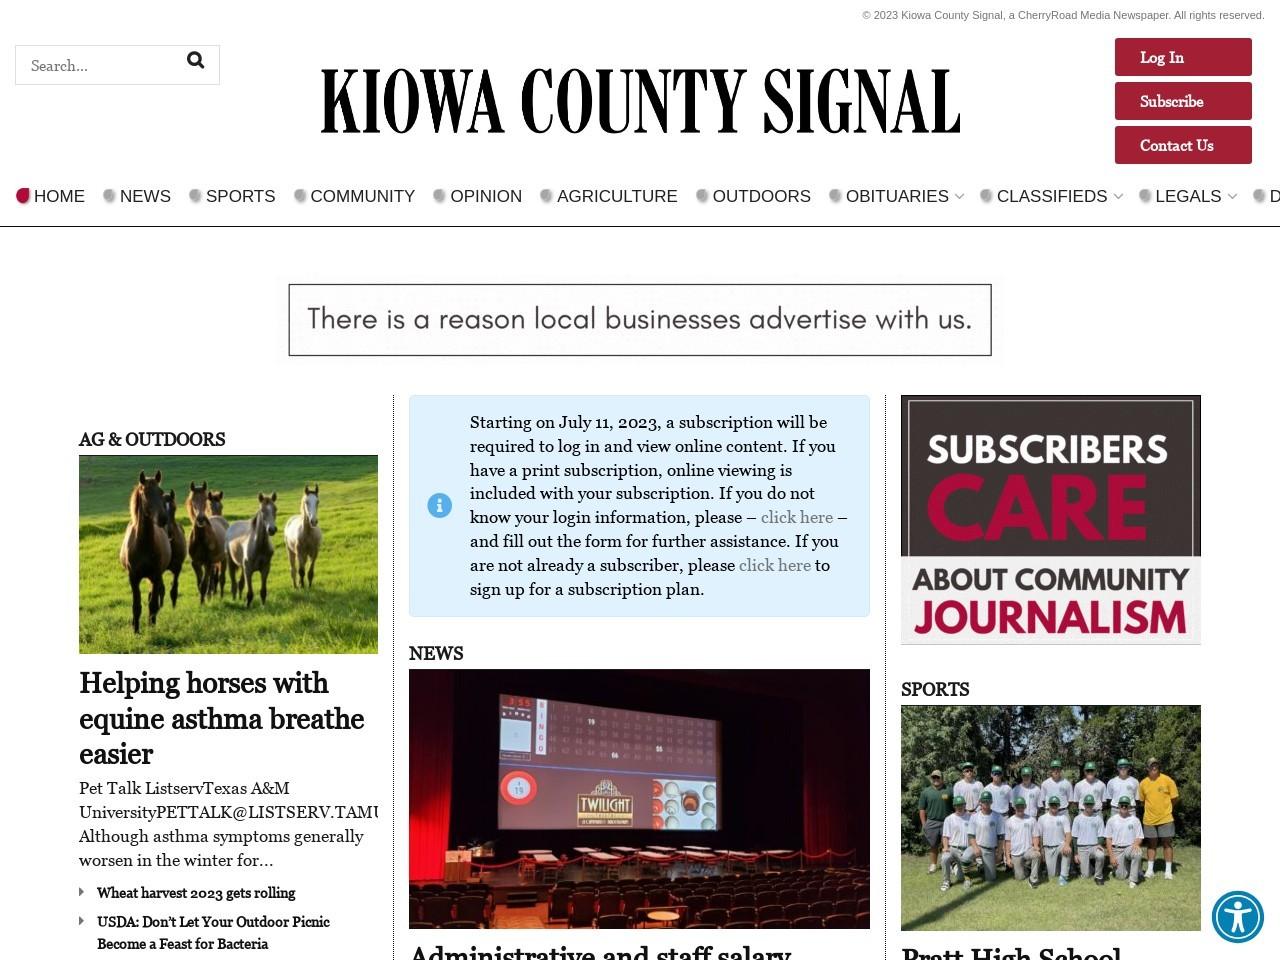 kiowacountysignal.com